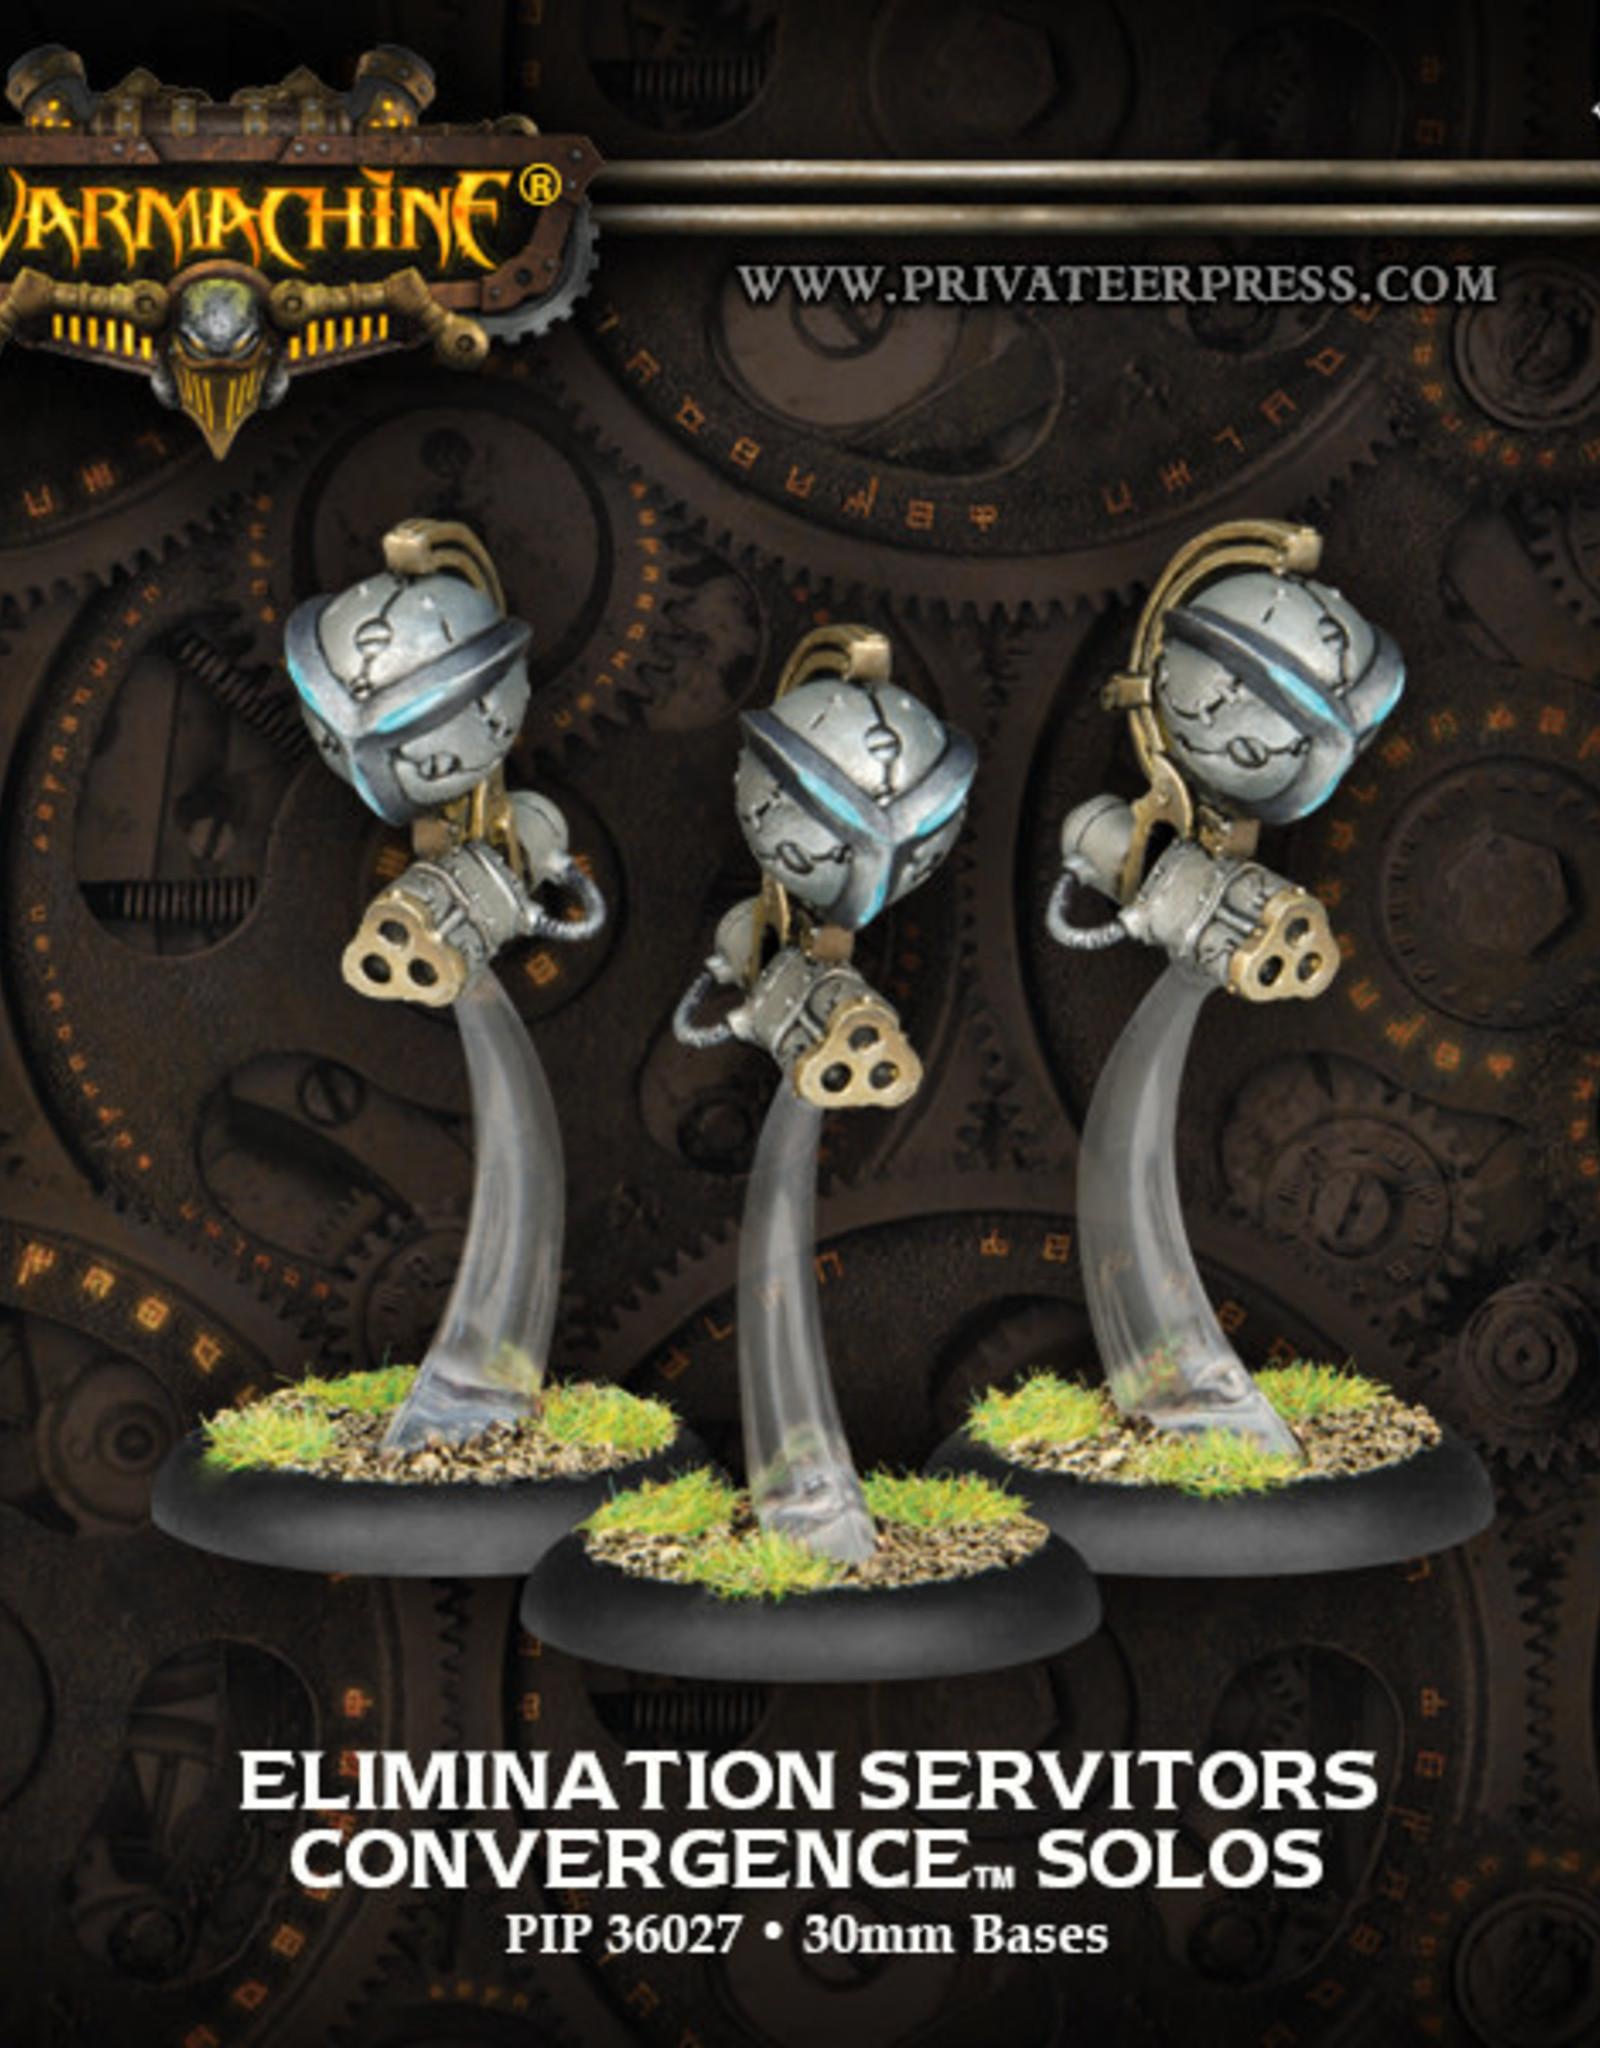 Warmachine Cyriss - Elimination Servitors